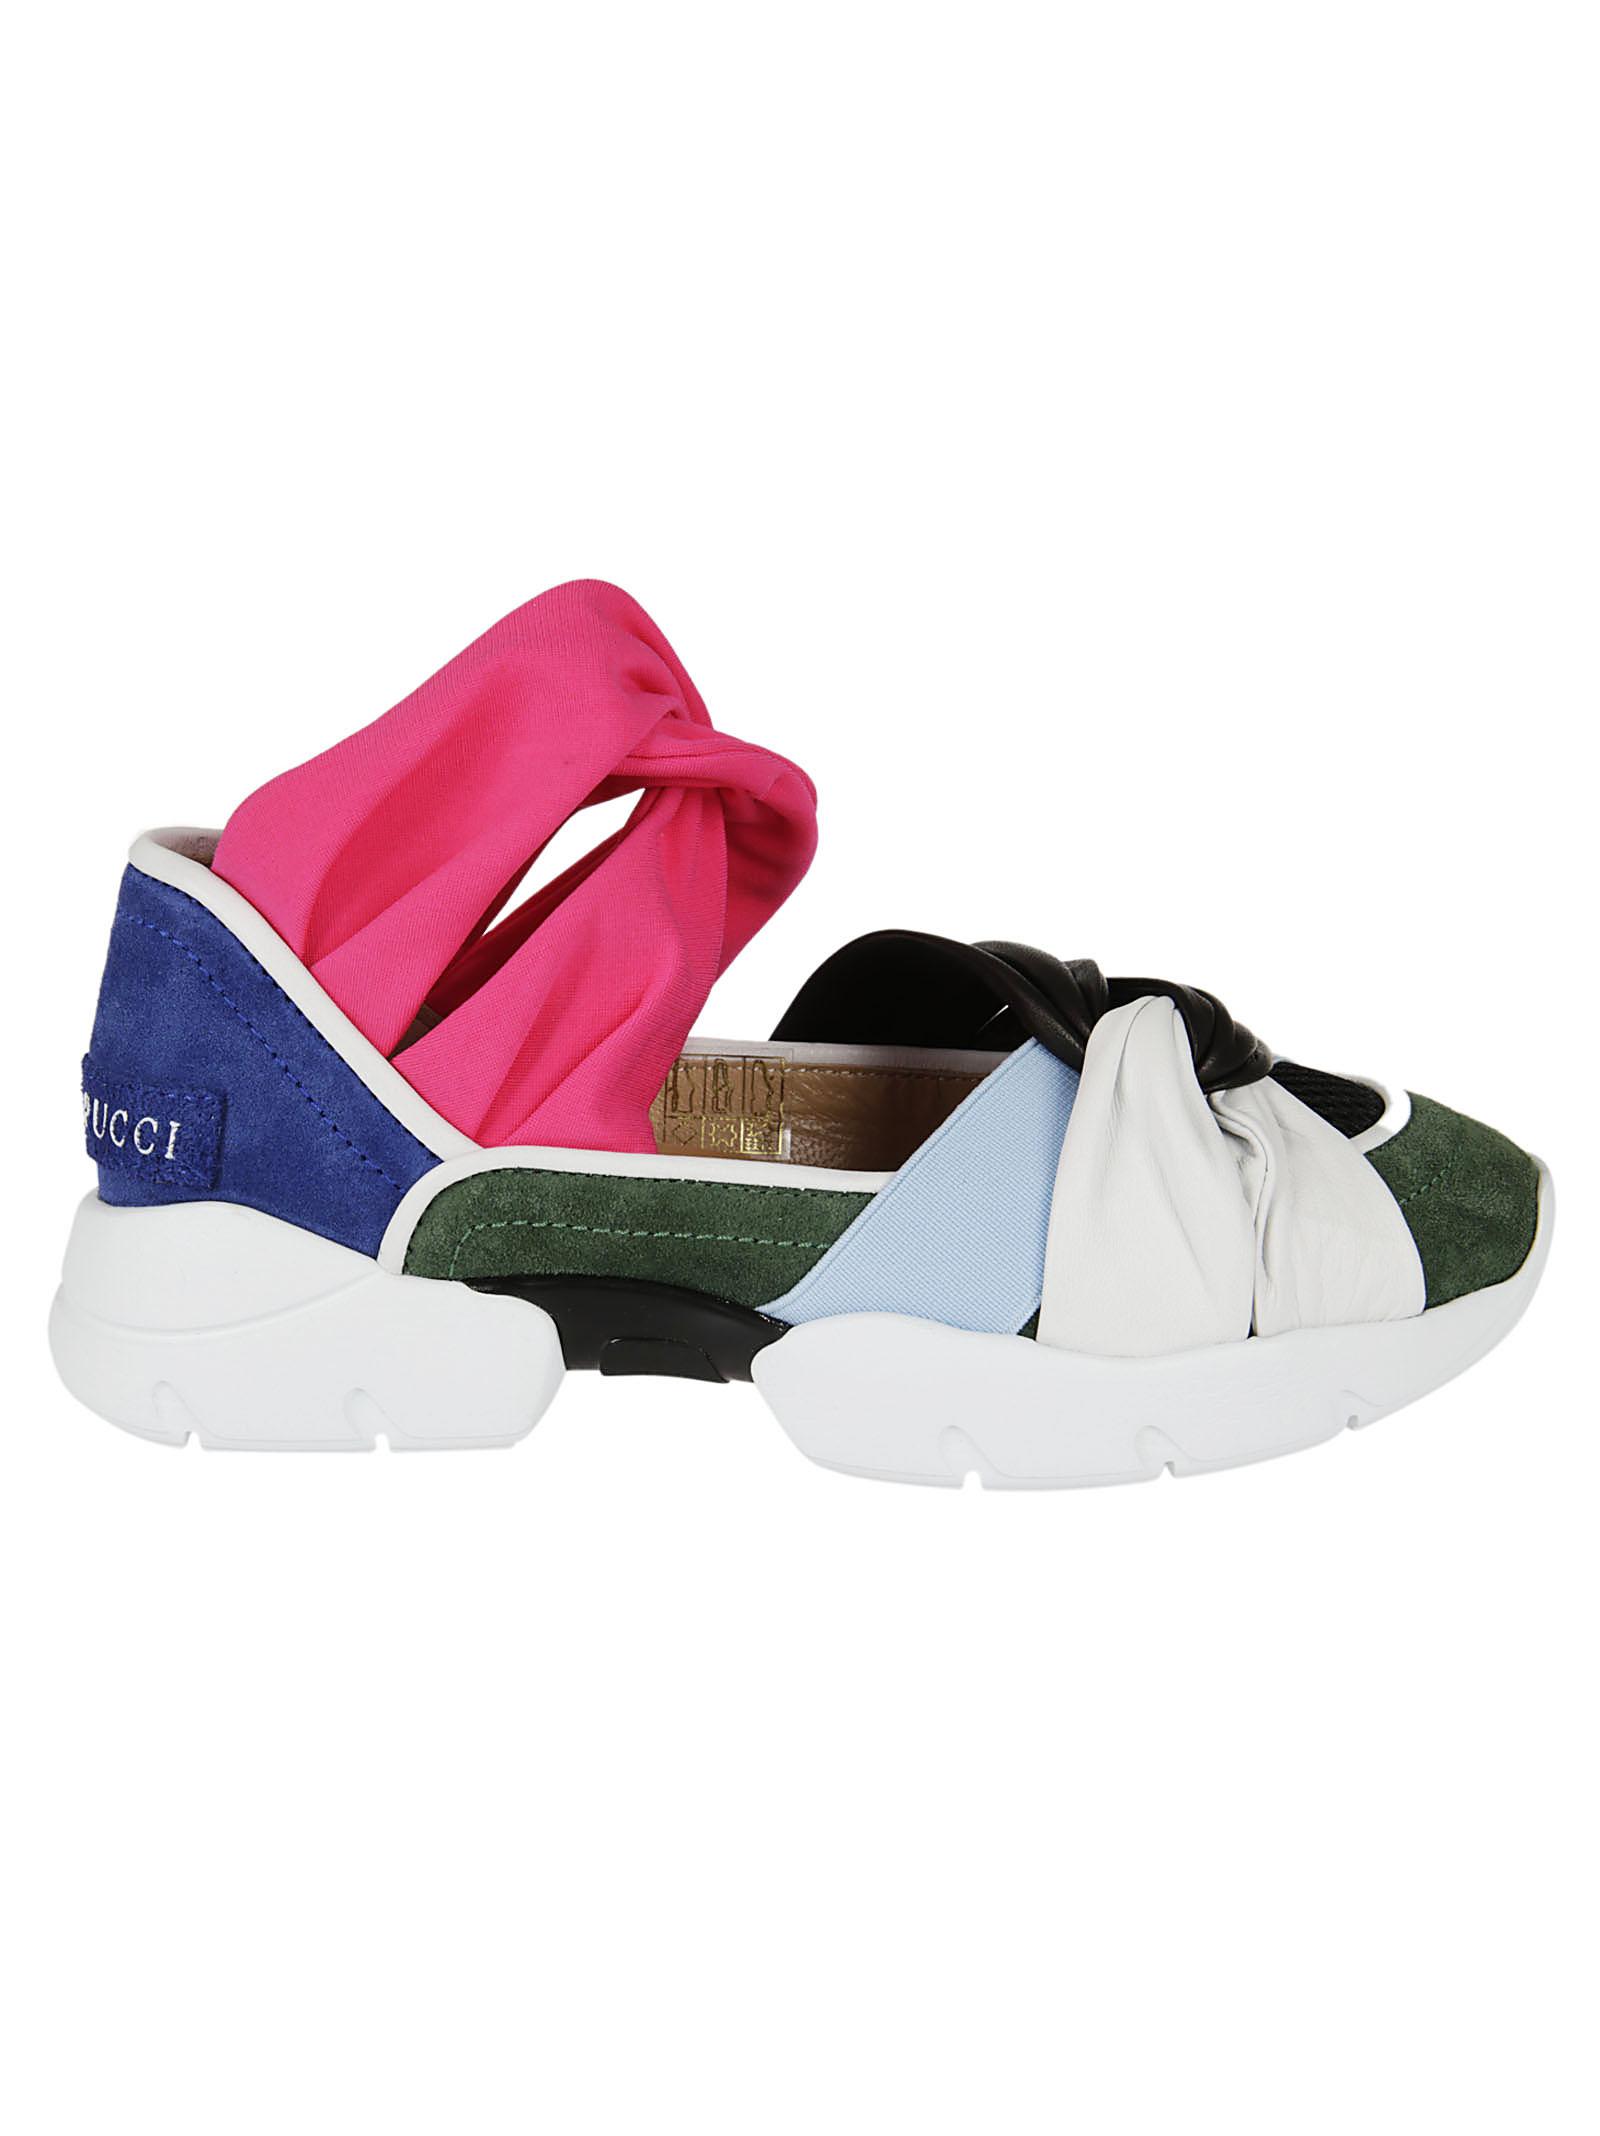 Emilio Pucci Emilio Pucci Suede Sneakers